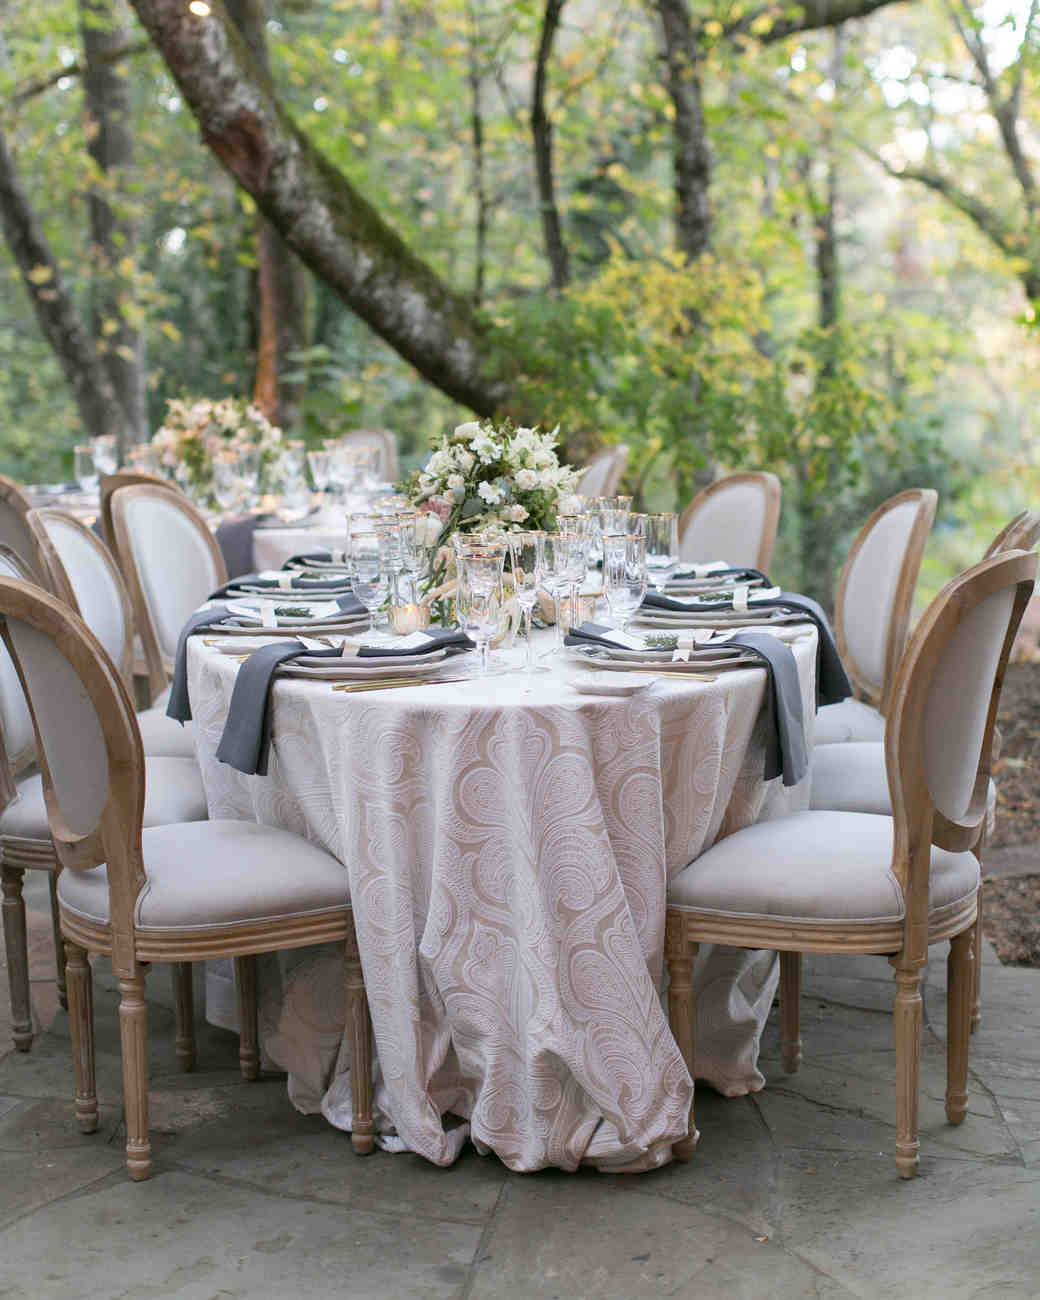 briana-adam-wedding-table-0957-s112471-1215.jpg